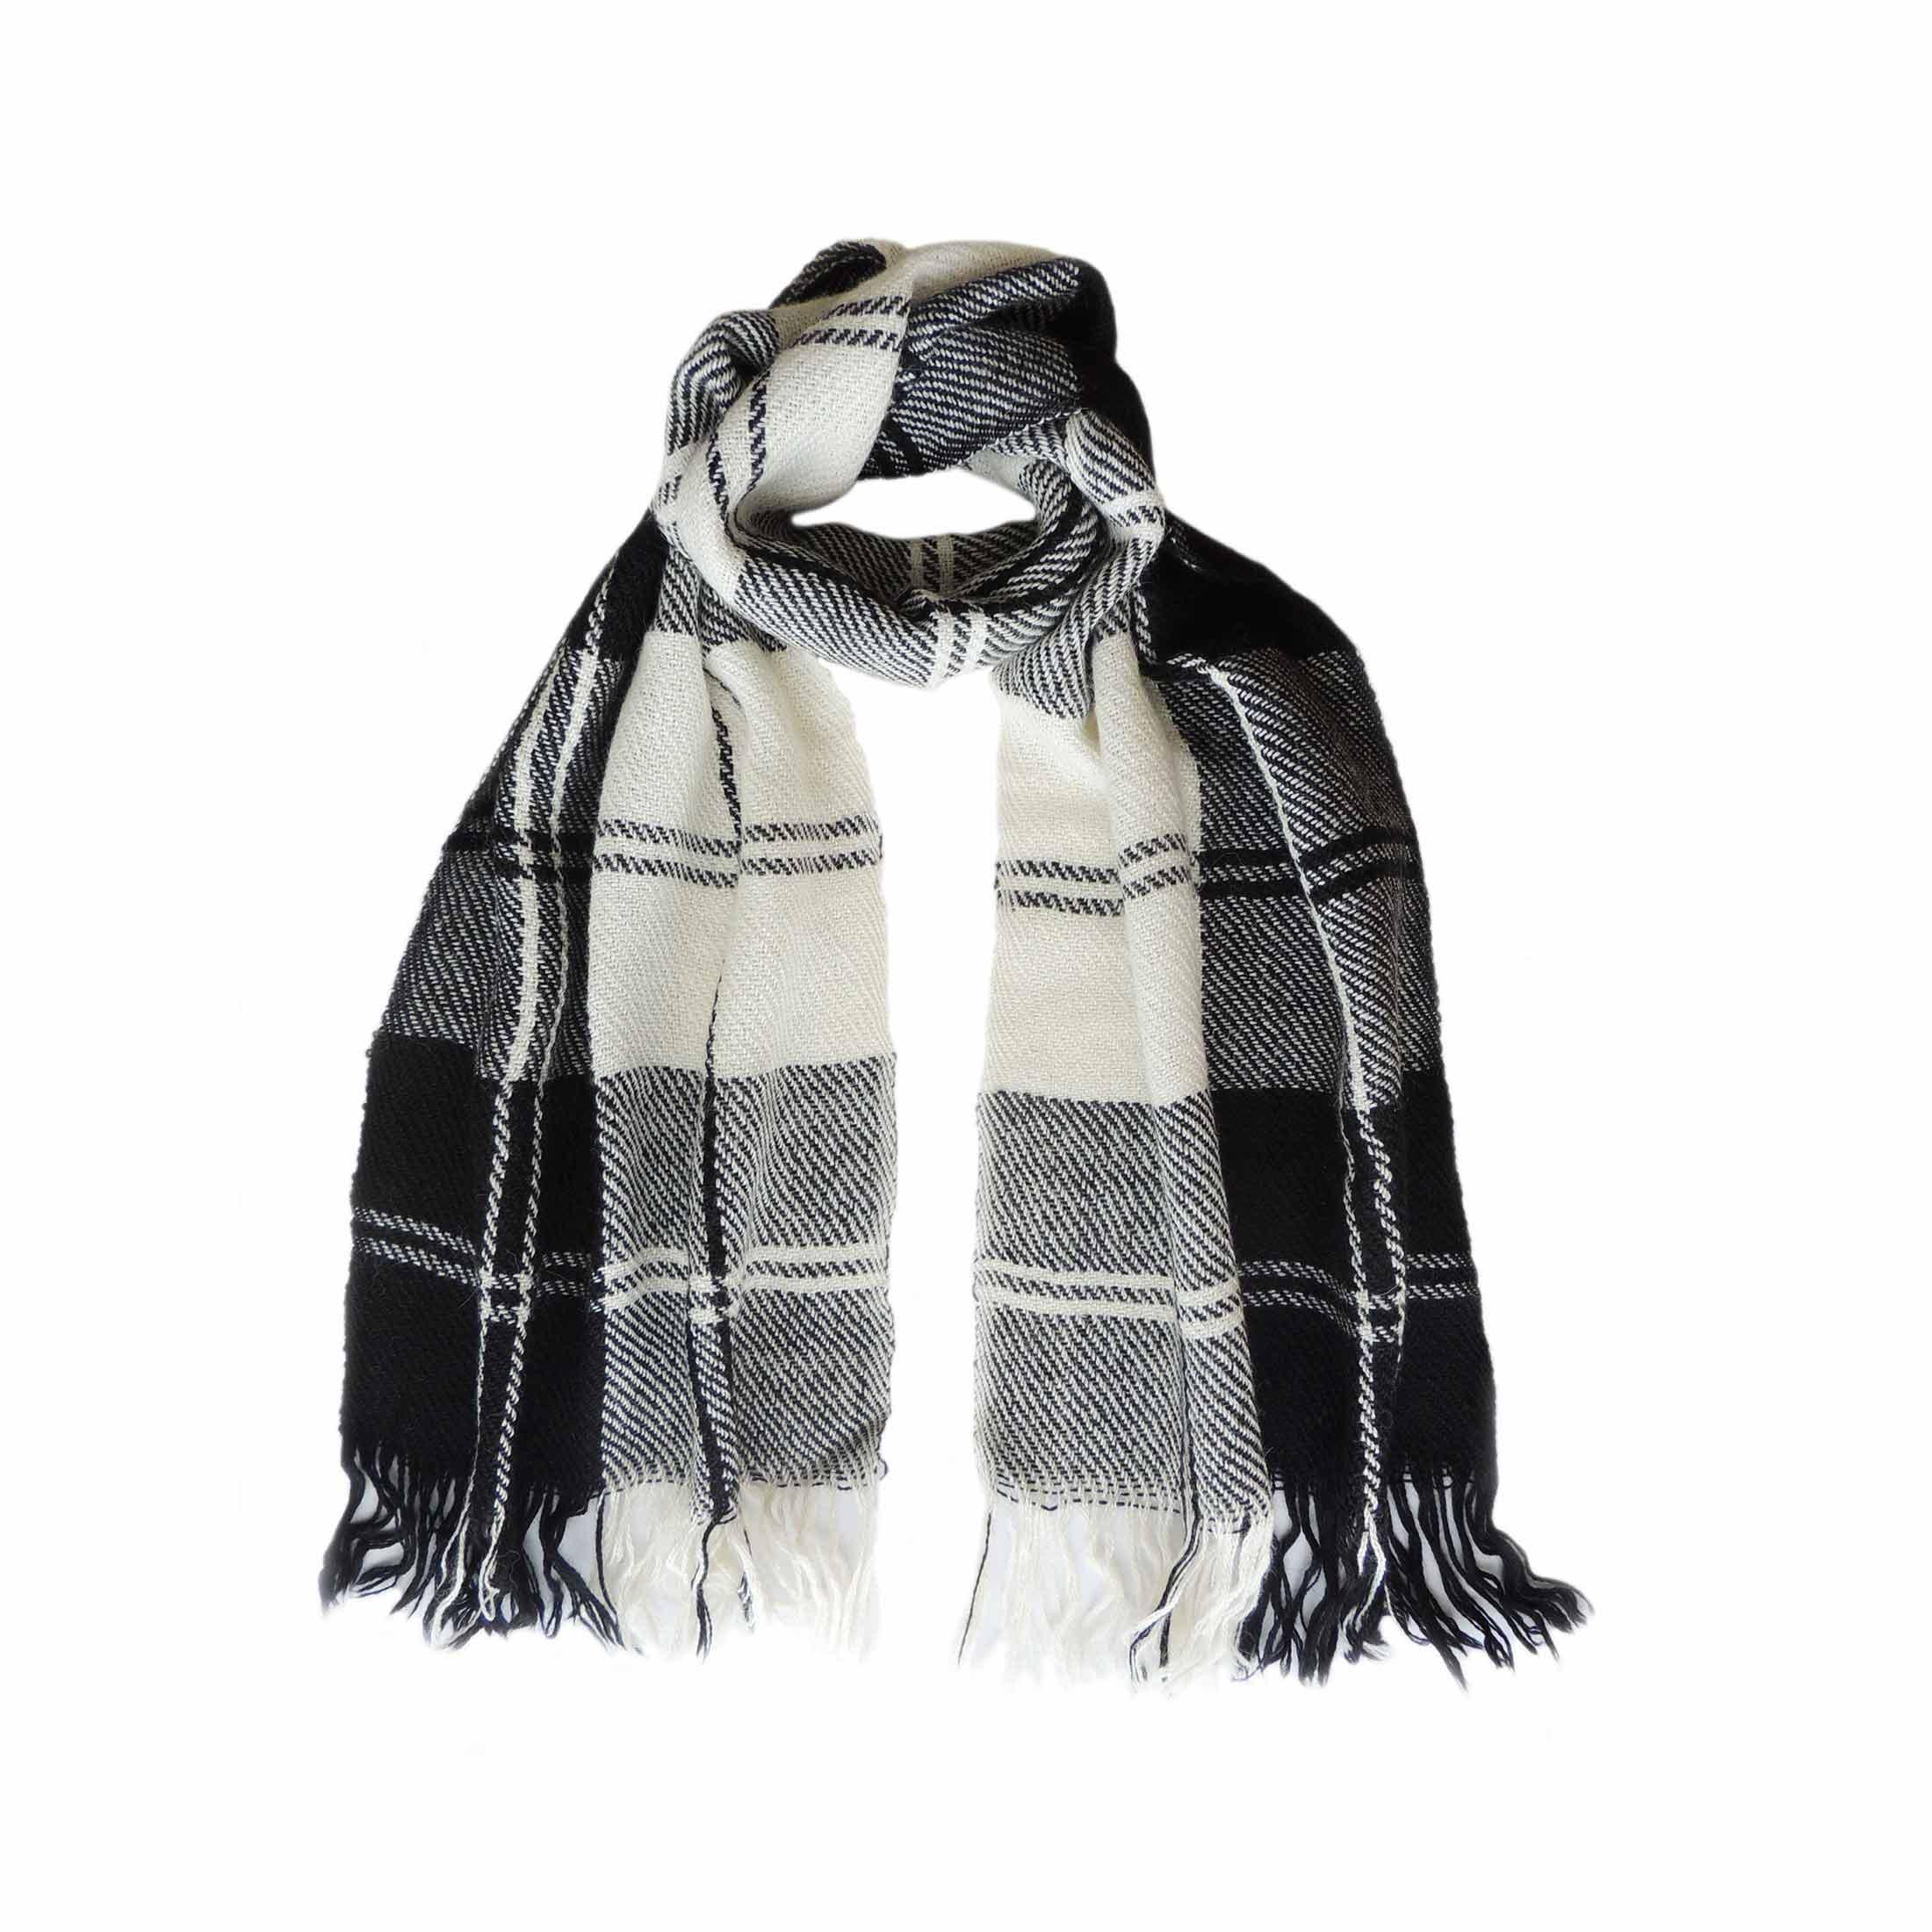 001-11-2038-01 Popsfl wholesale producer Scarf, black white plaid pattern